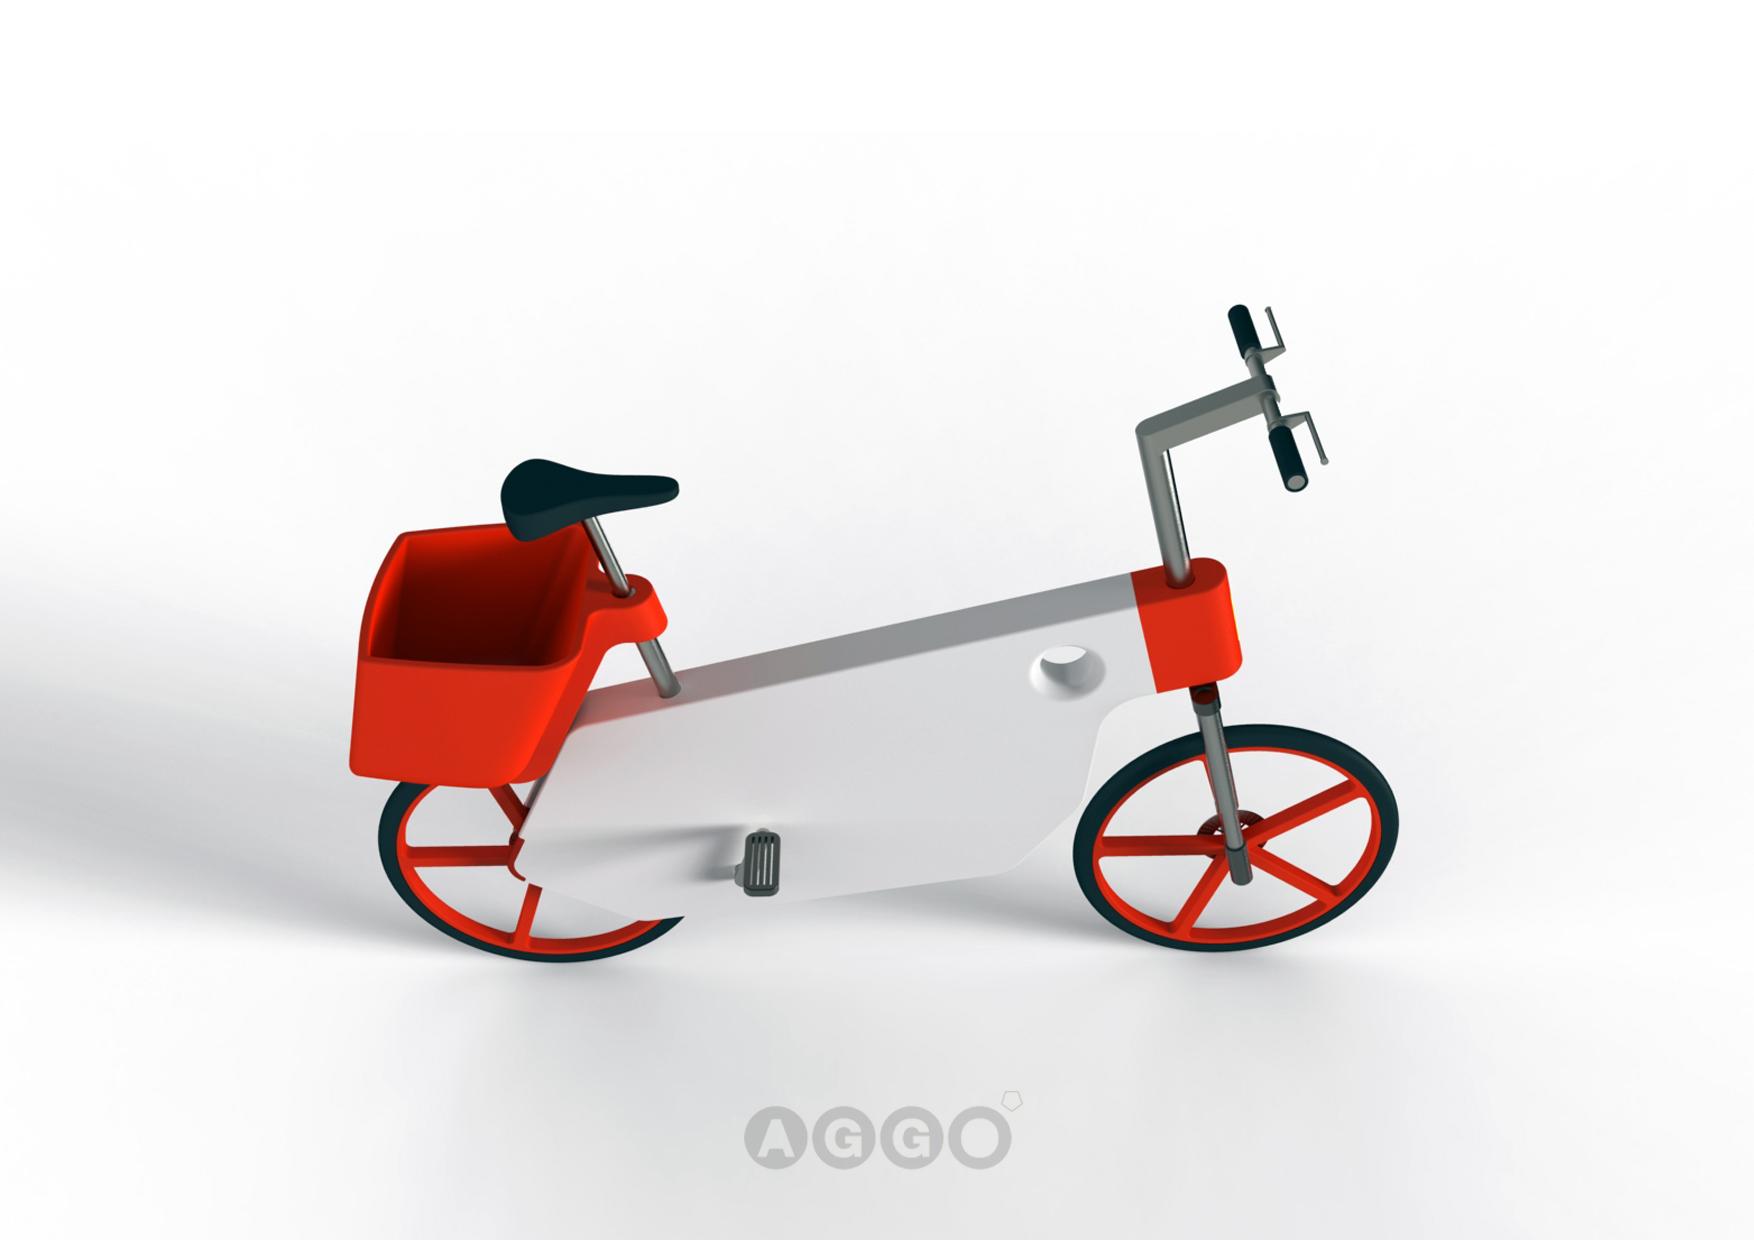 aggo_tesla_bike020.jpg